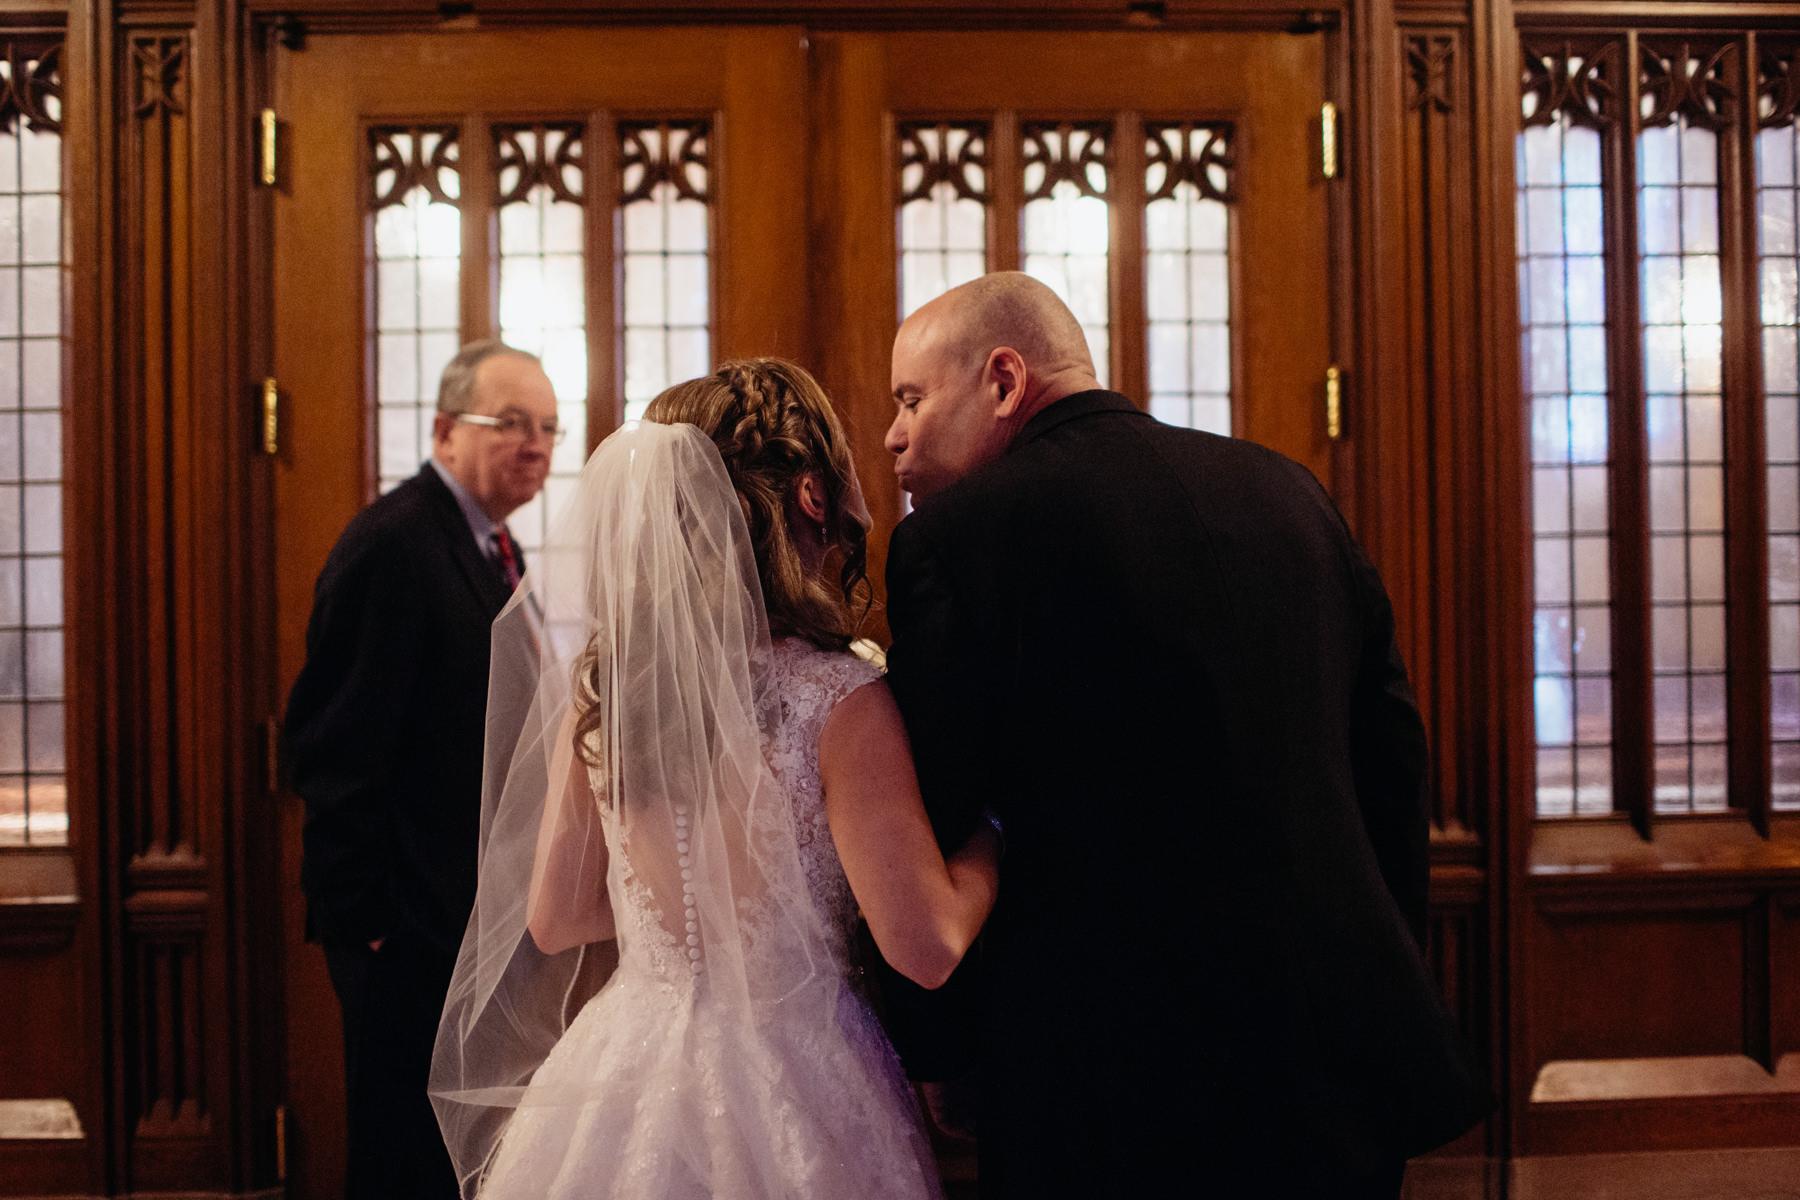 Quincy Ma Massachusetts Wedding Dedham Boston Granie Links Wedding New England Catholic Cathedral Liz Osban Photography 33.jpg